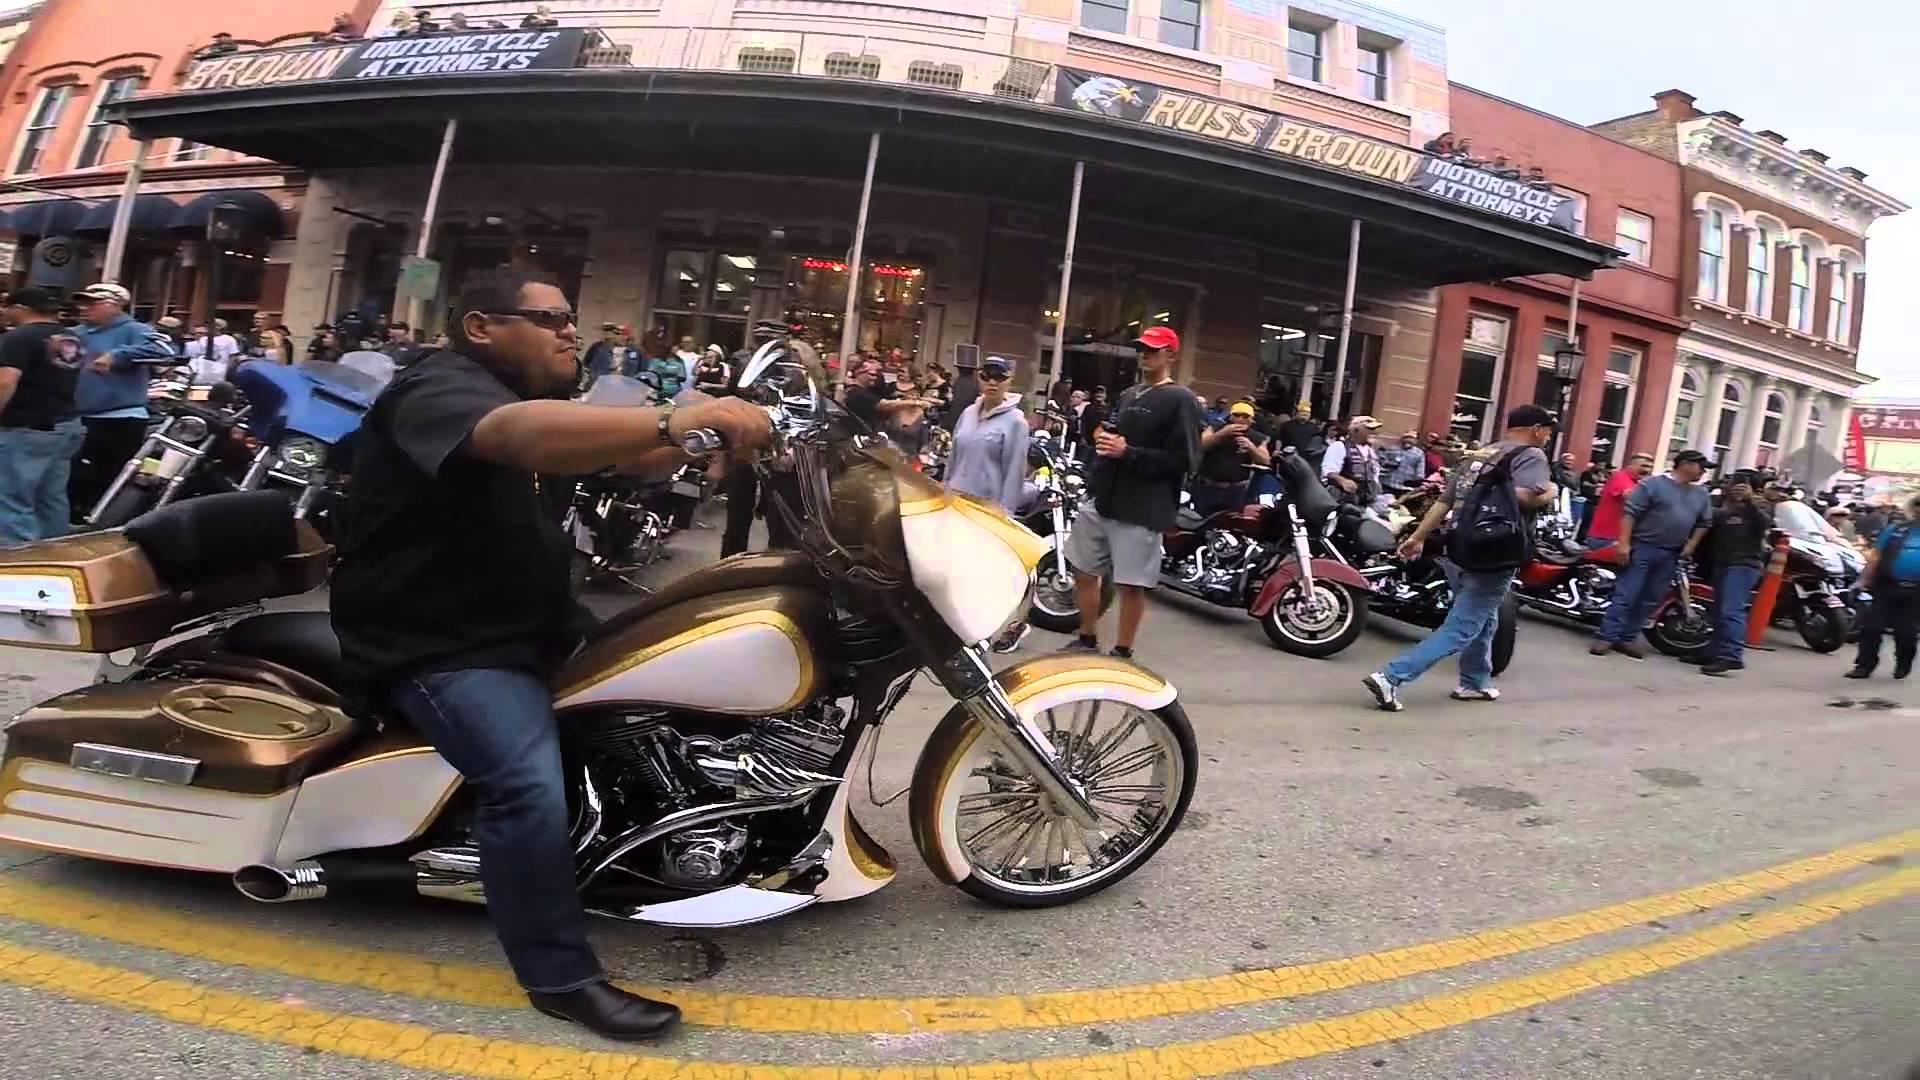 galveston bike rally 2k14 - YouTube